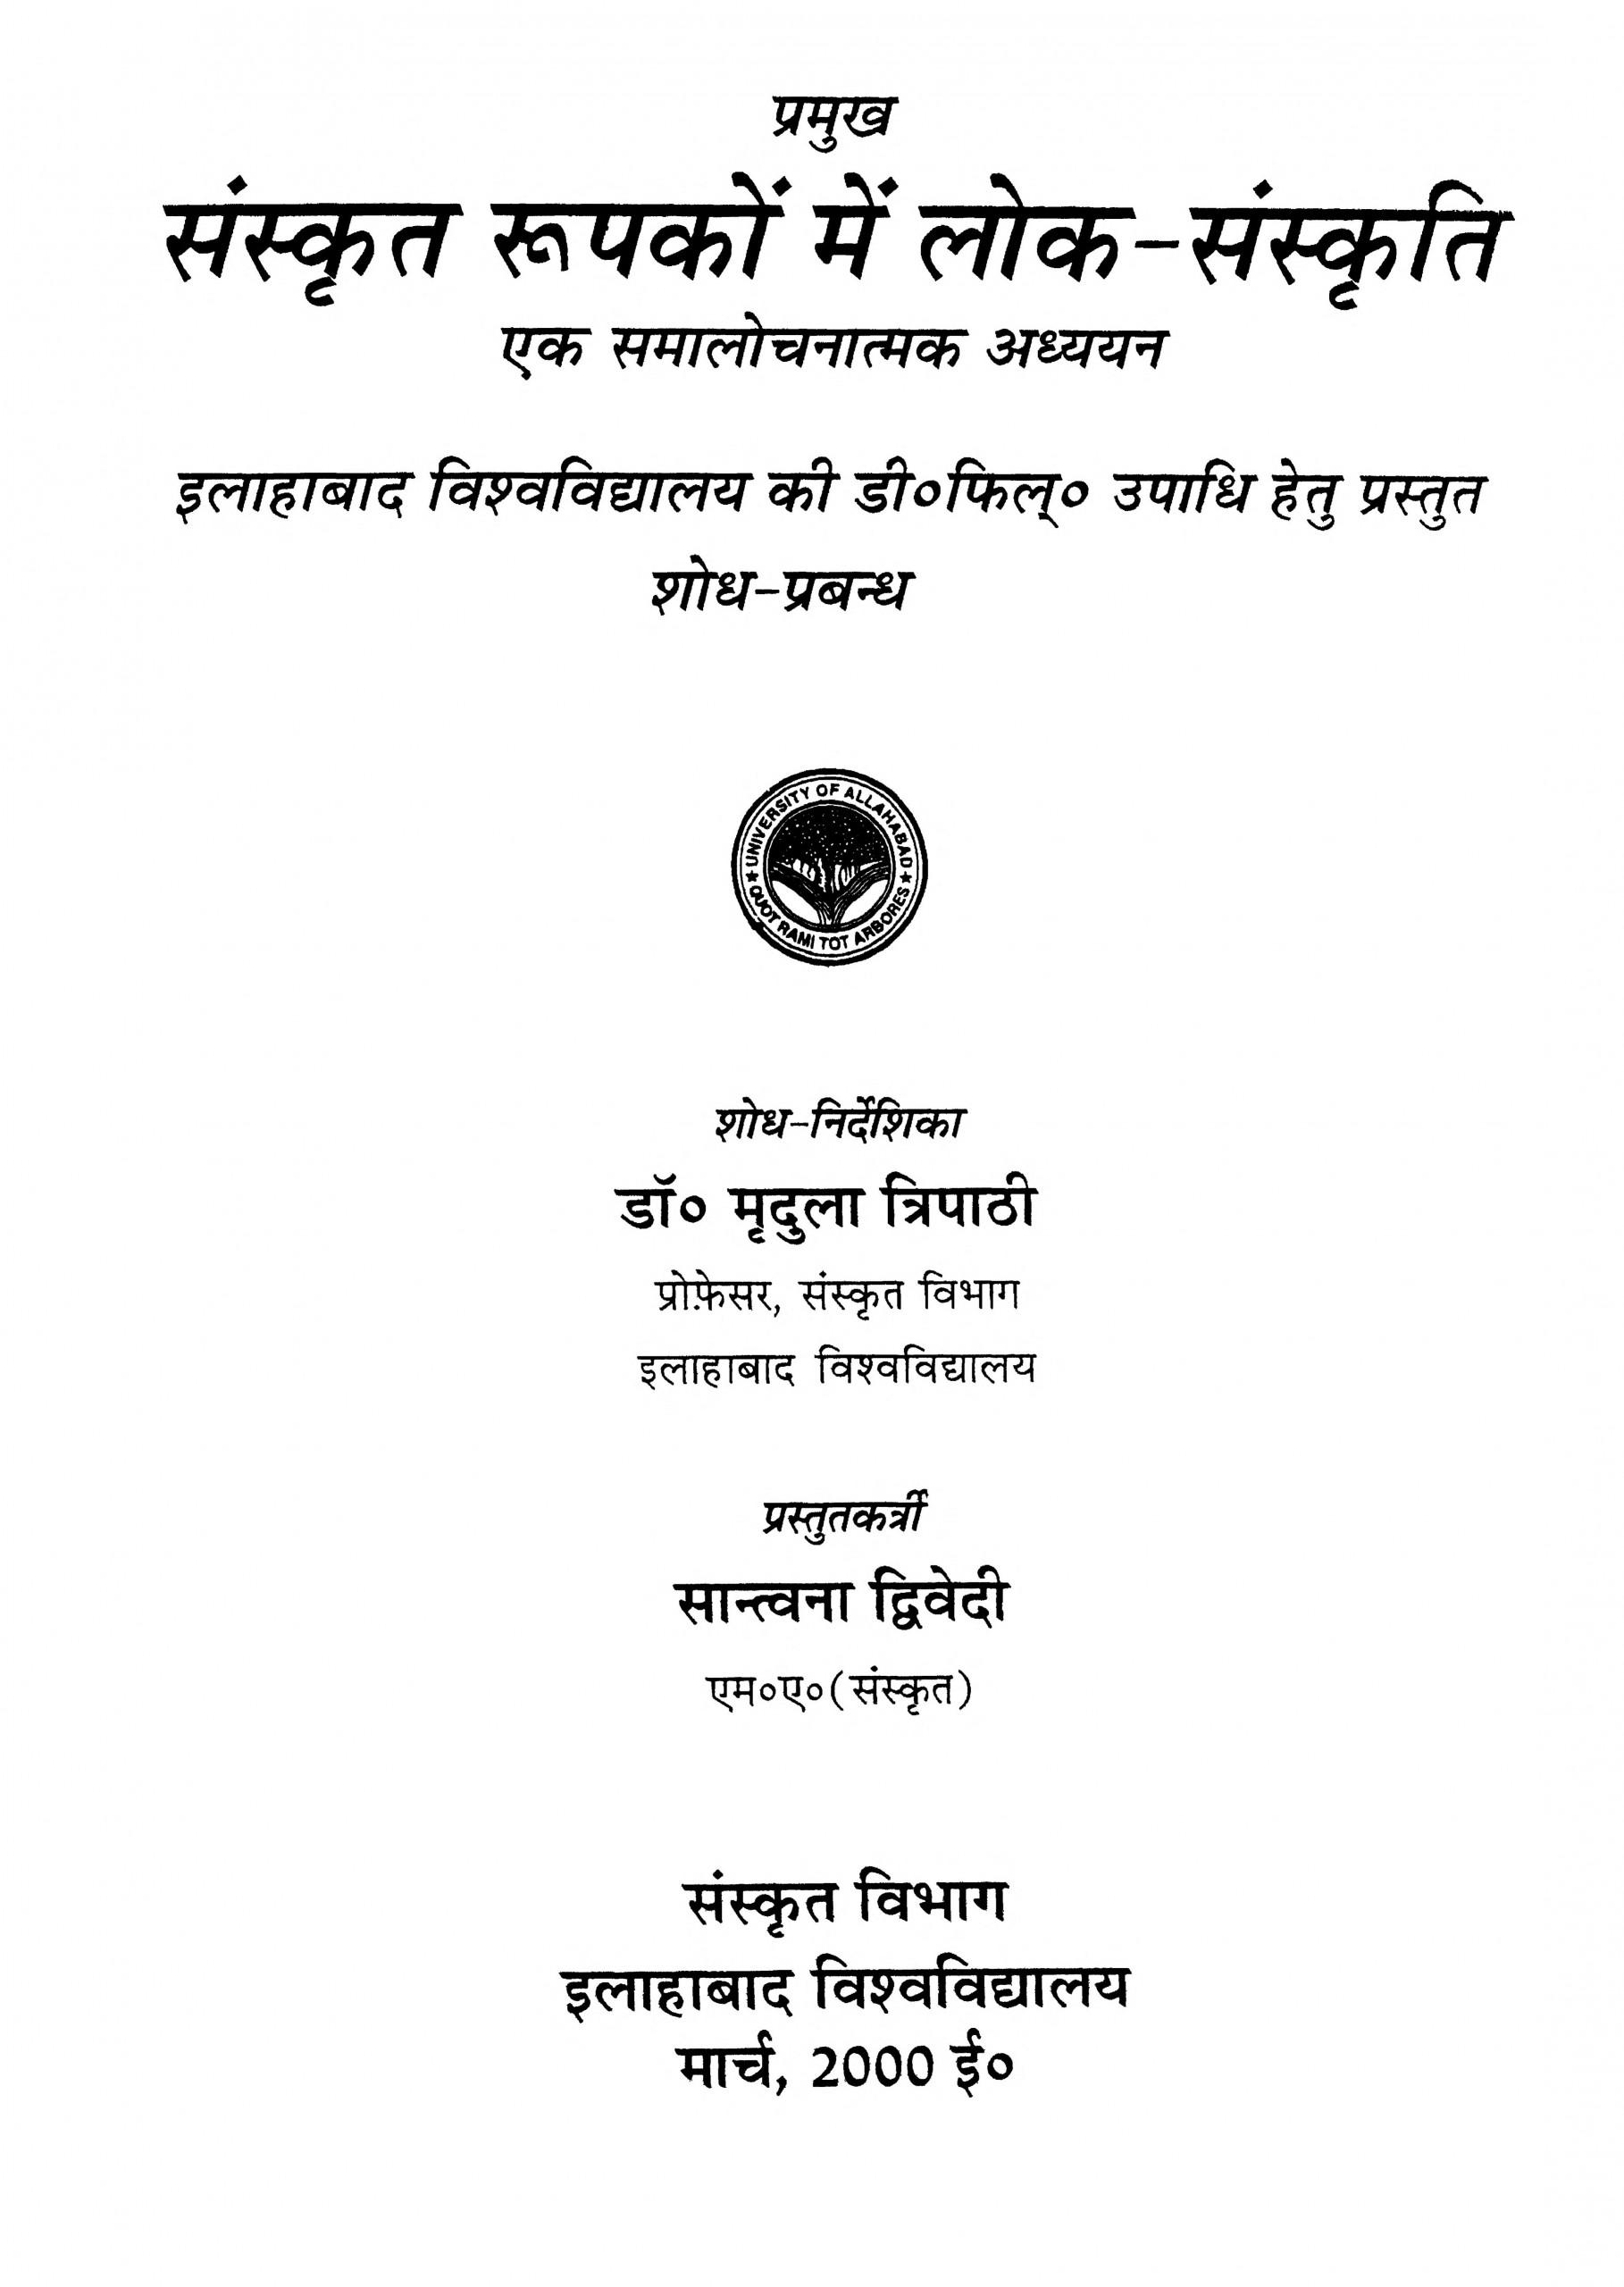 Book Image : संस्कृत रूपकों में लोक - संस्कृति - Sanskrit Rupakon Men Lok - Sanskriti